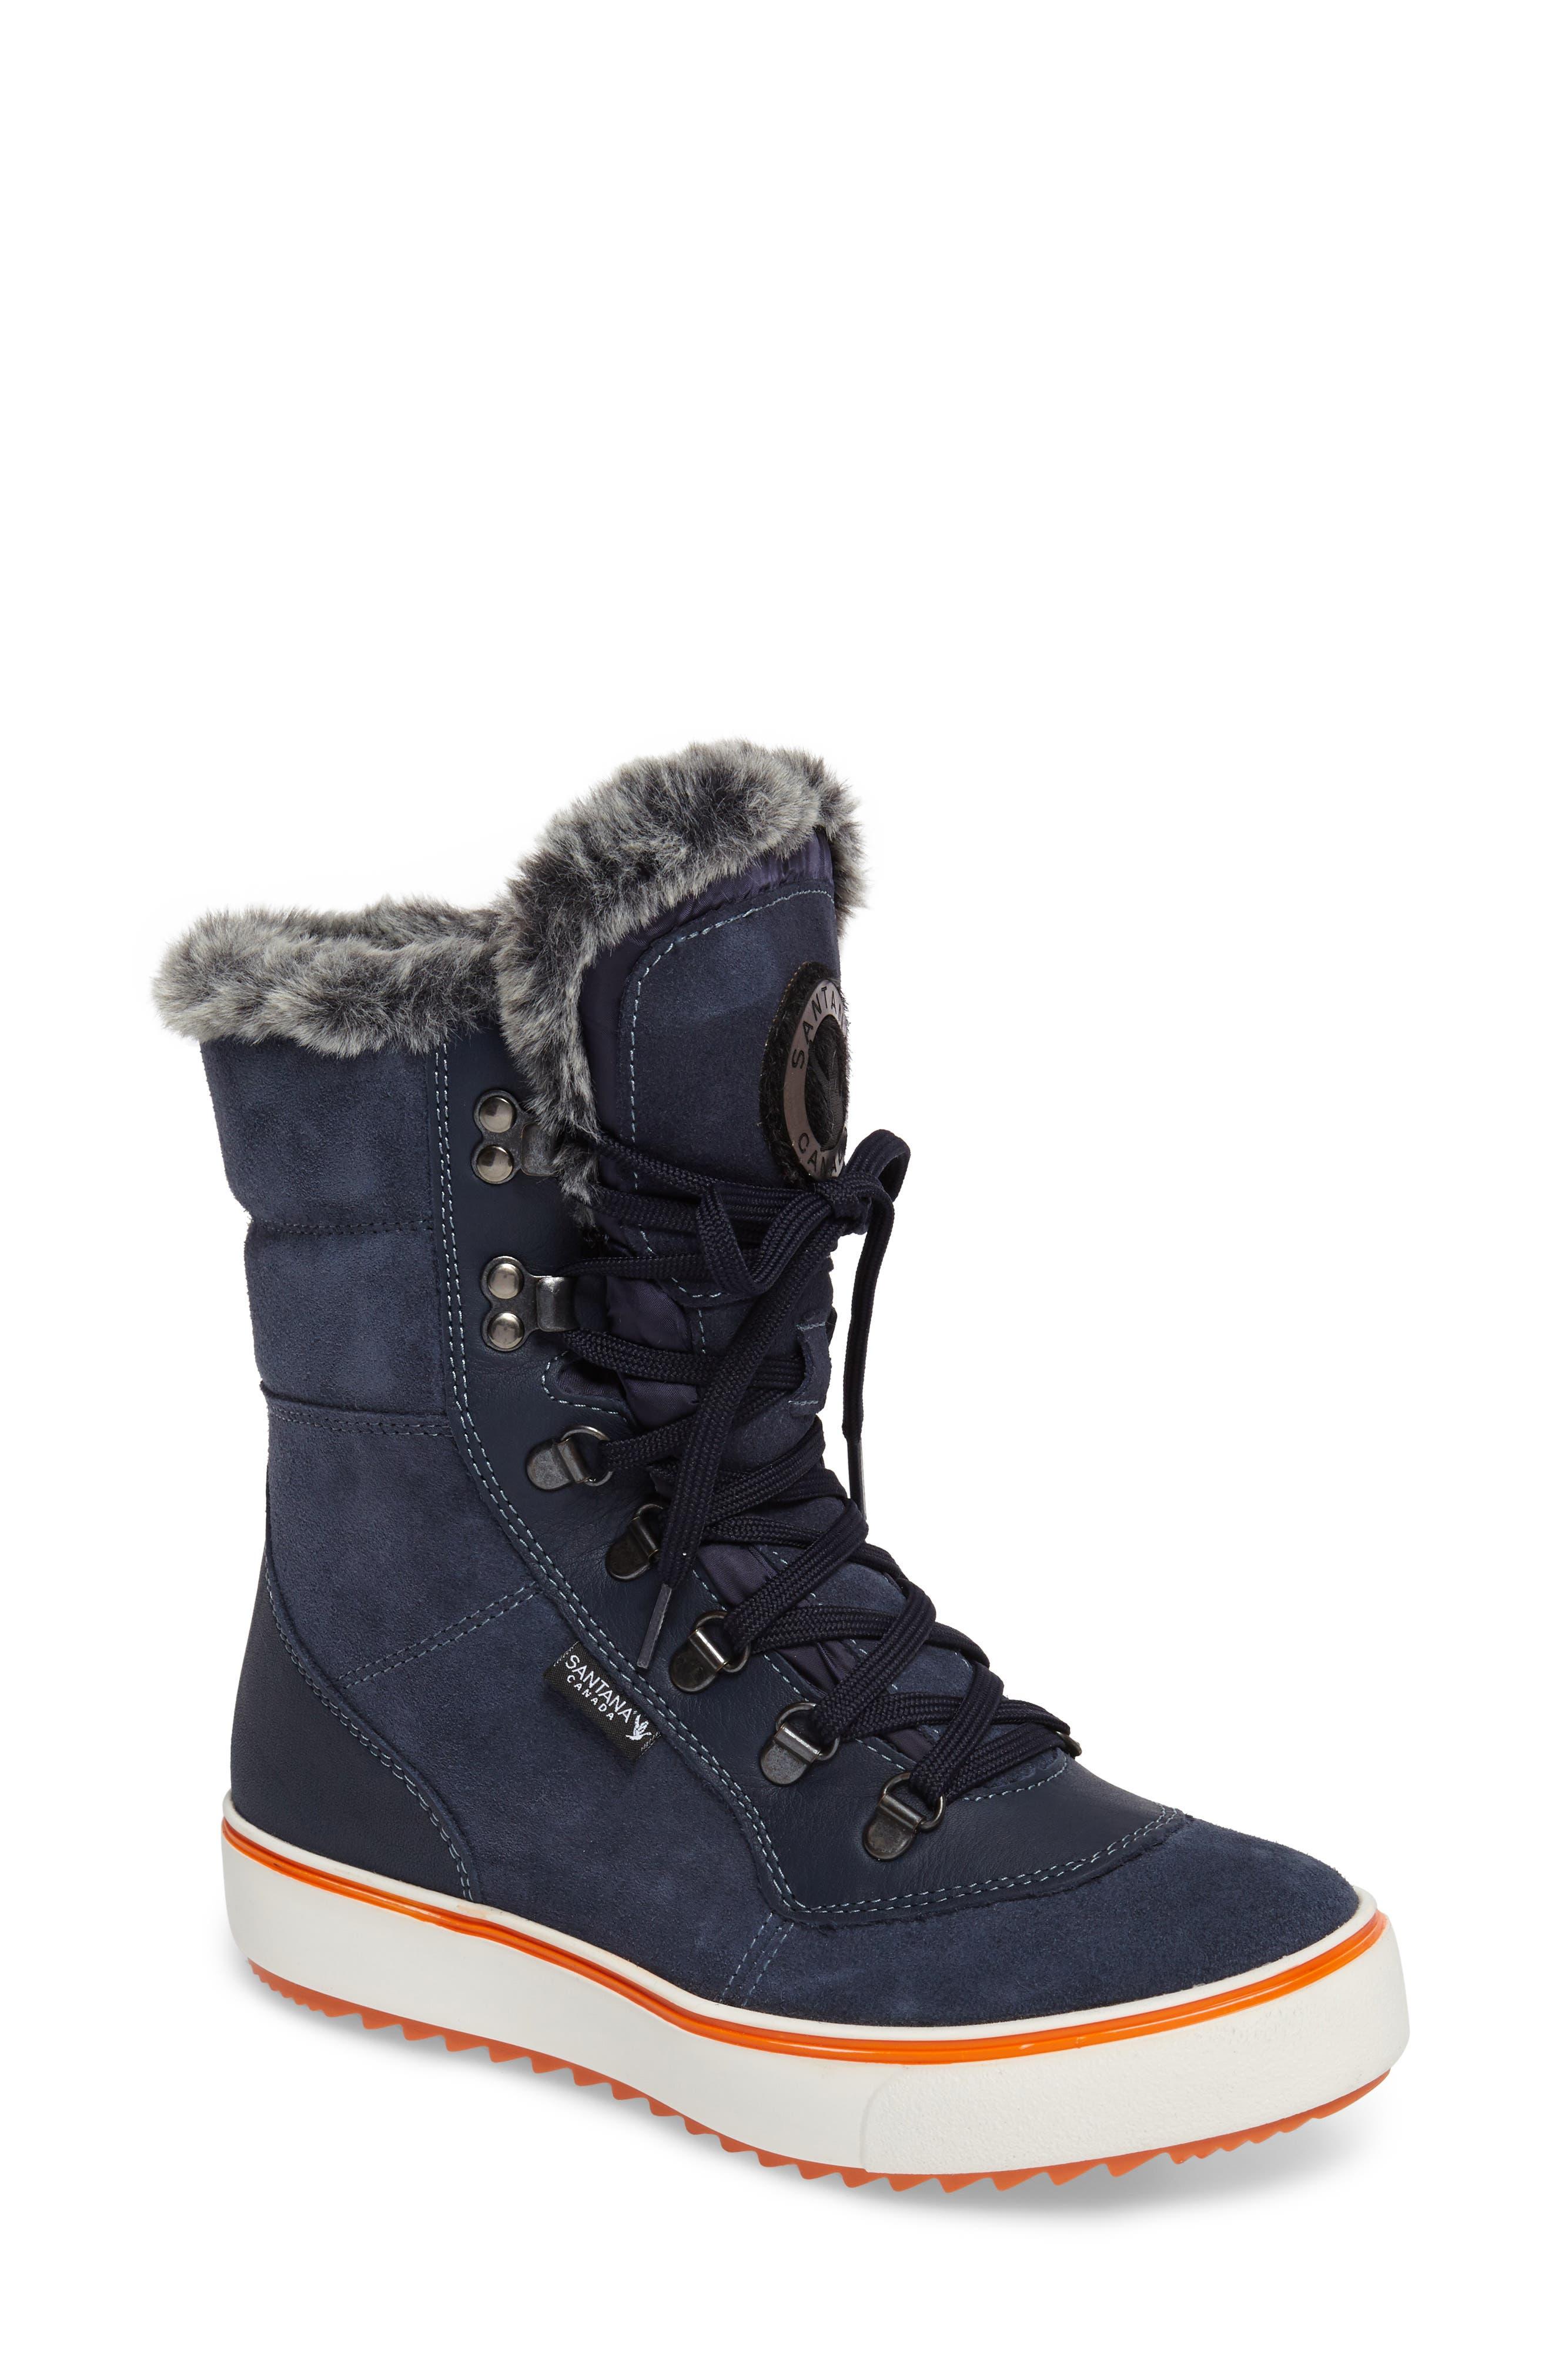 Mixx Faux Fur Waterproof Boot,                             Main thumbnail 1, color,                             410